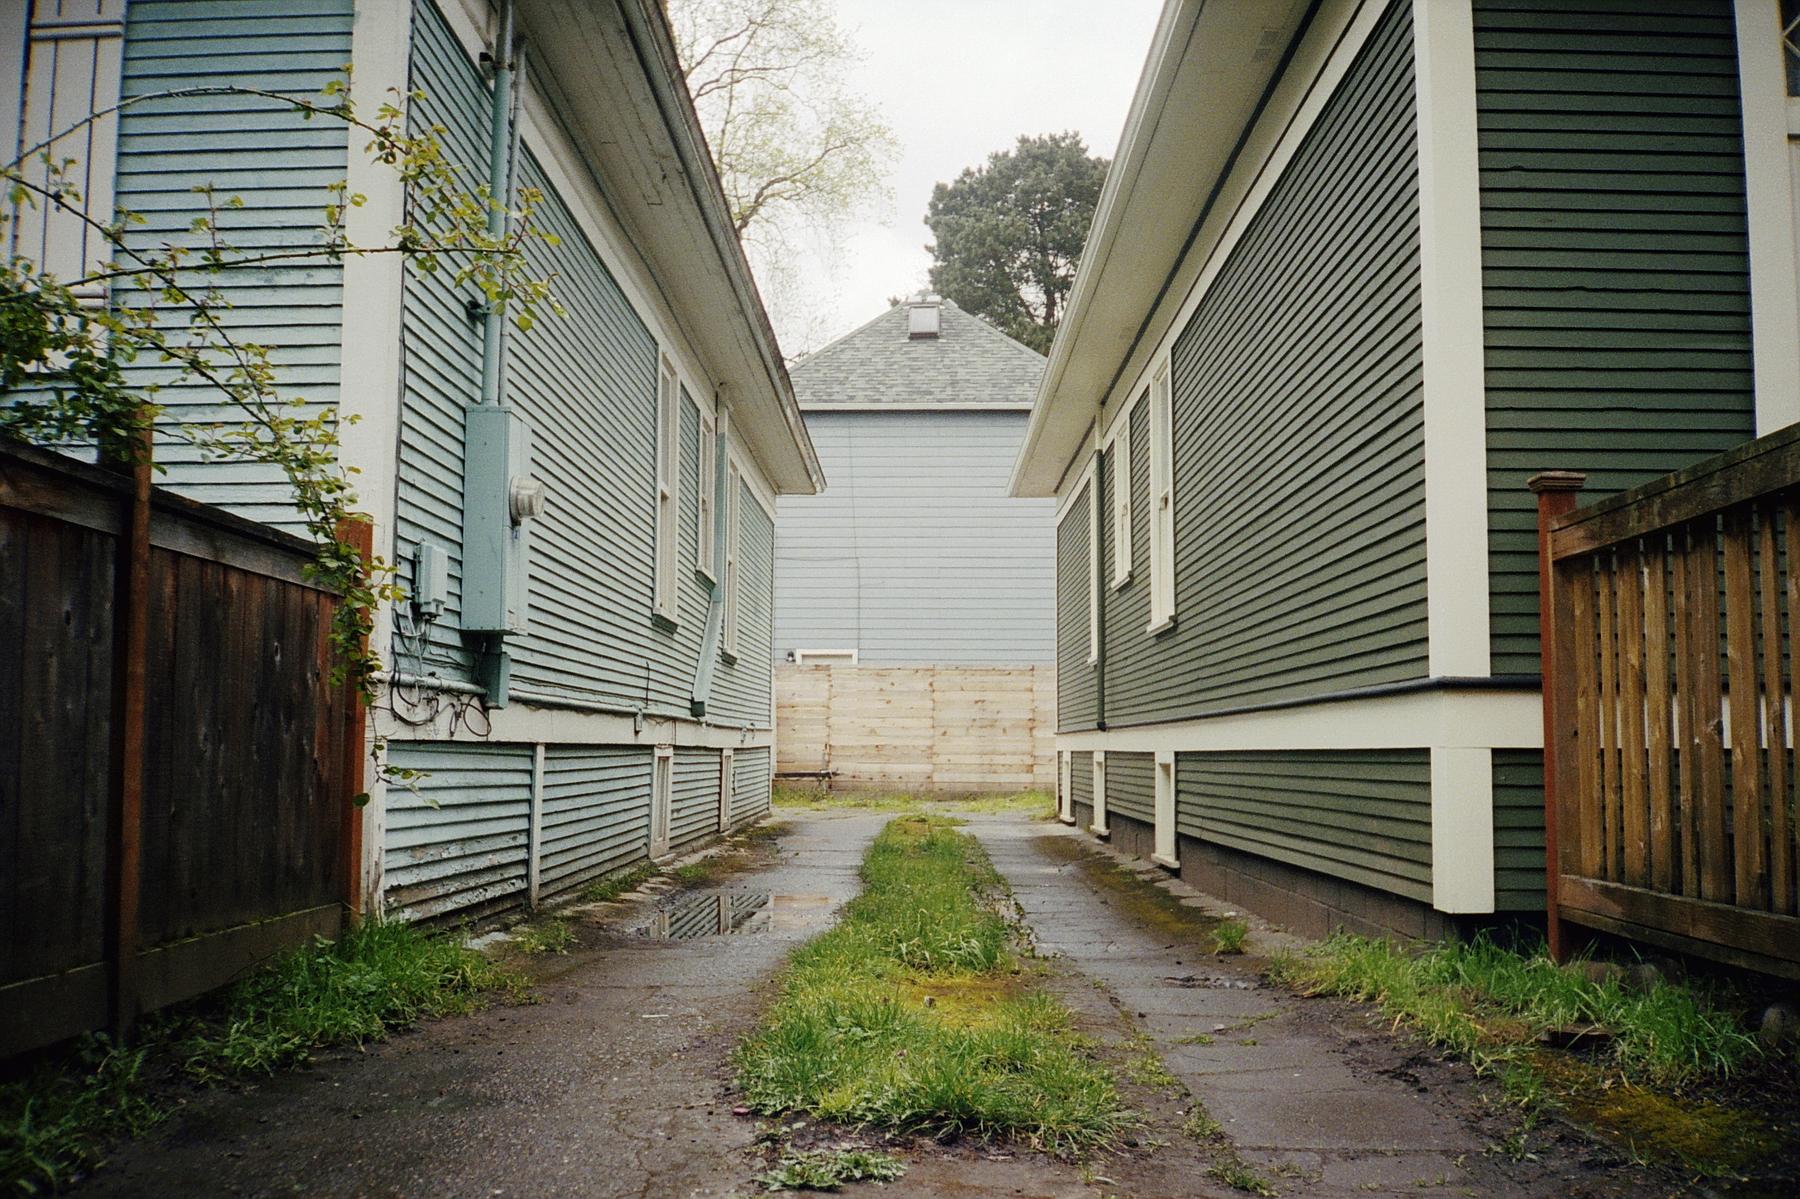 Driveway | Minolta PROD 20s | Kodak Portra 400 | Colton Allen